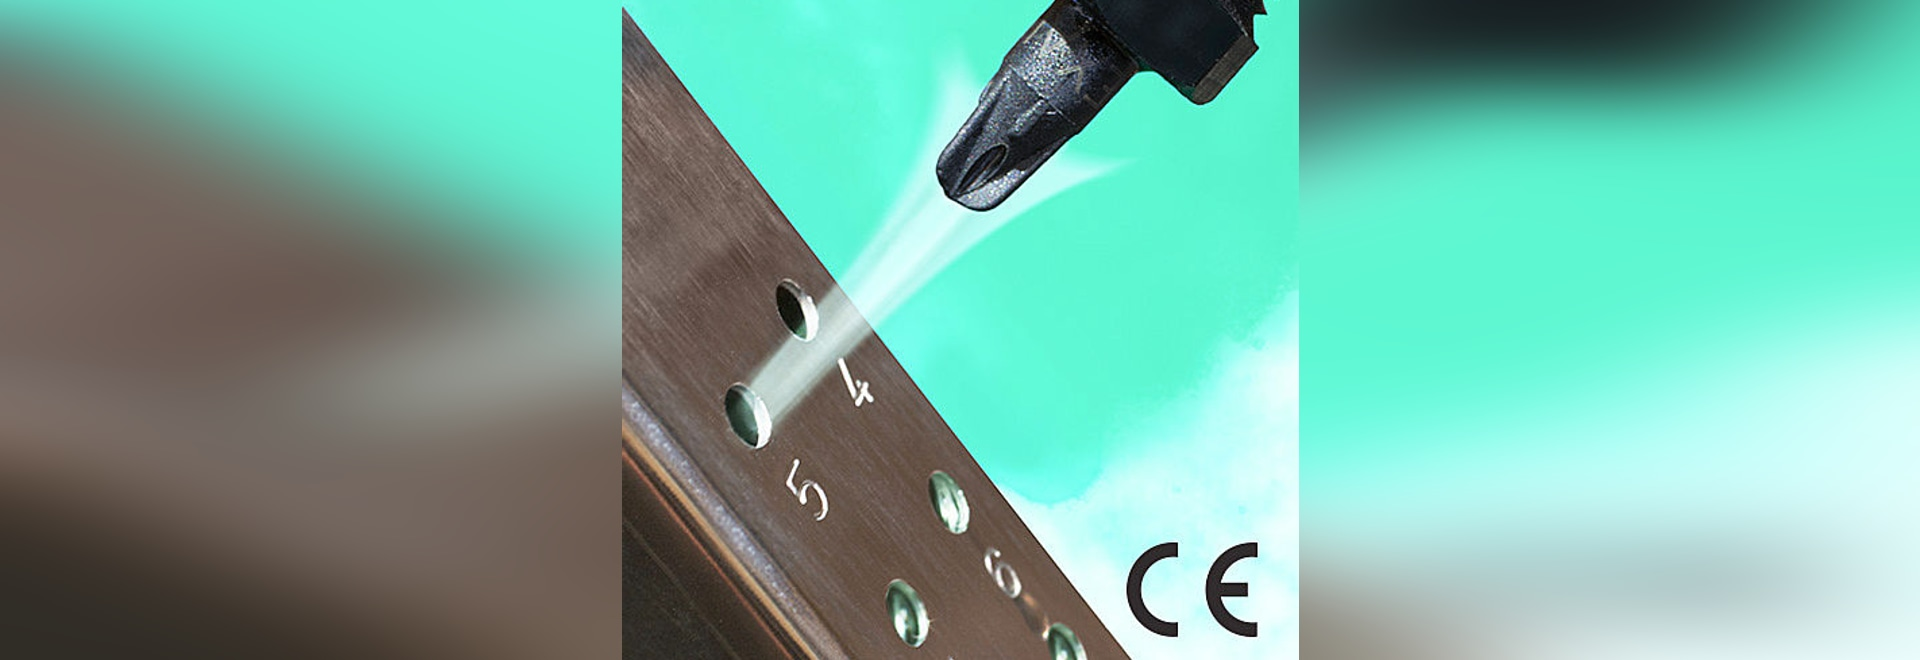 PEEK Pico Super Air Nozzle Assures Precise Non-Marring Blowoff